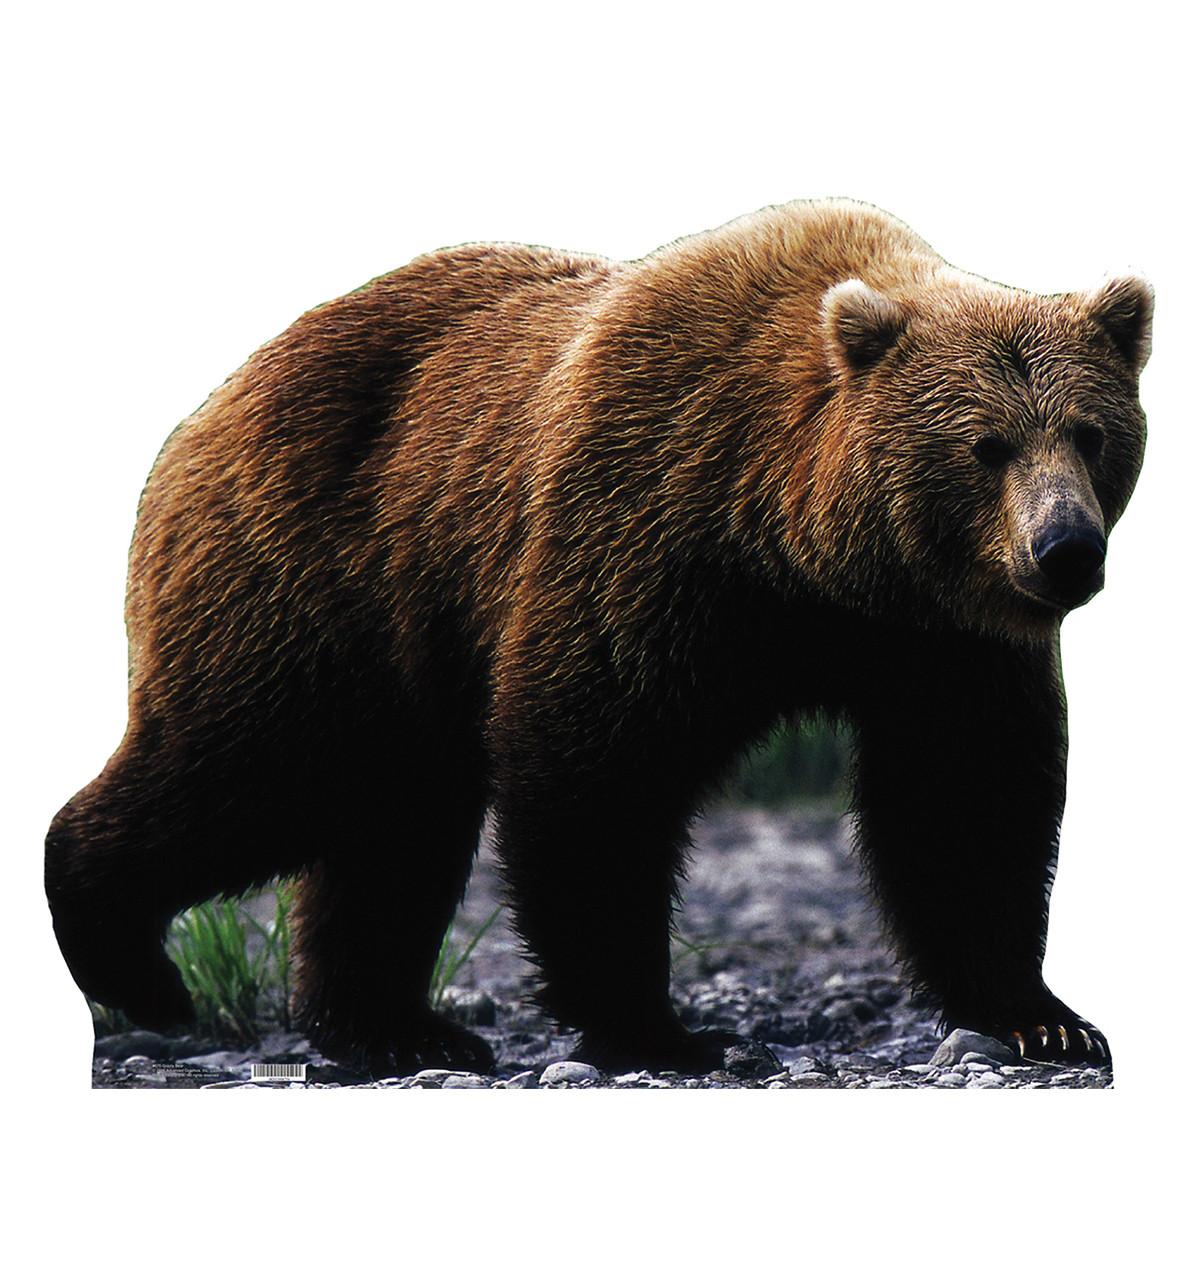 Life-size Grizzly Bear Cardboard Standup   Cardboard Cutout